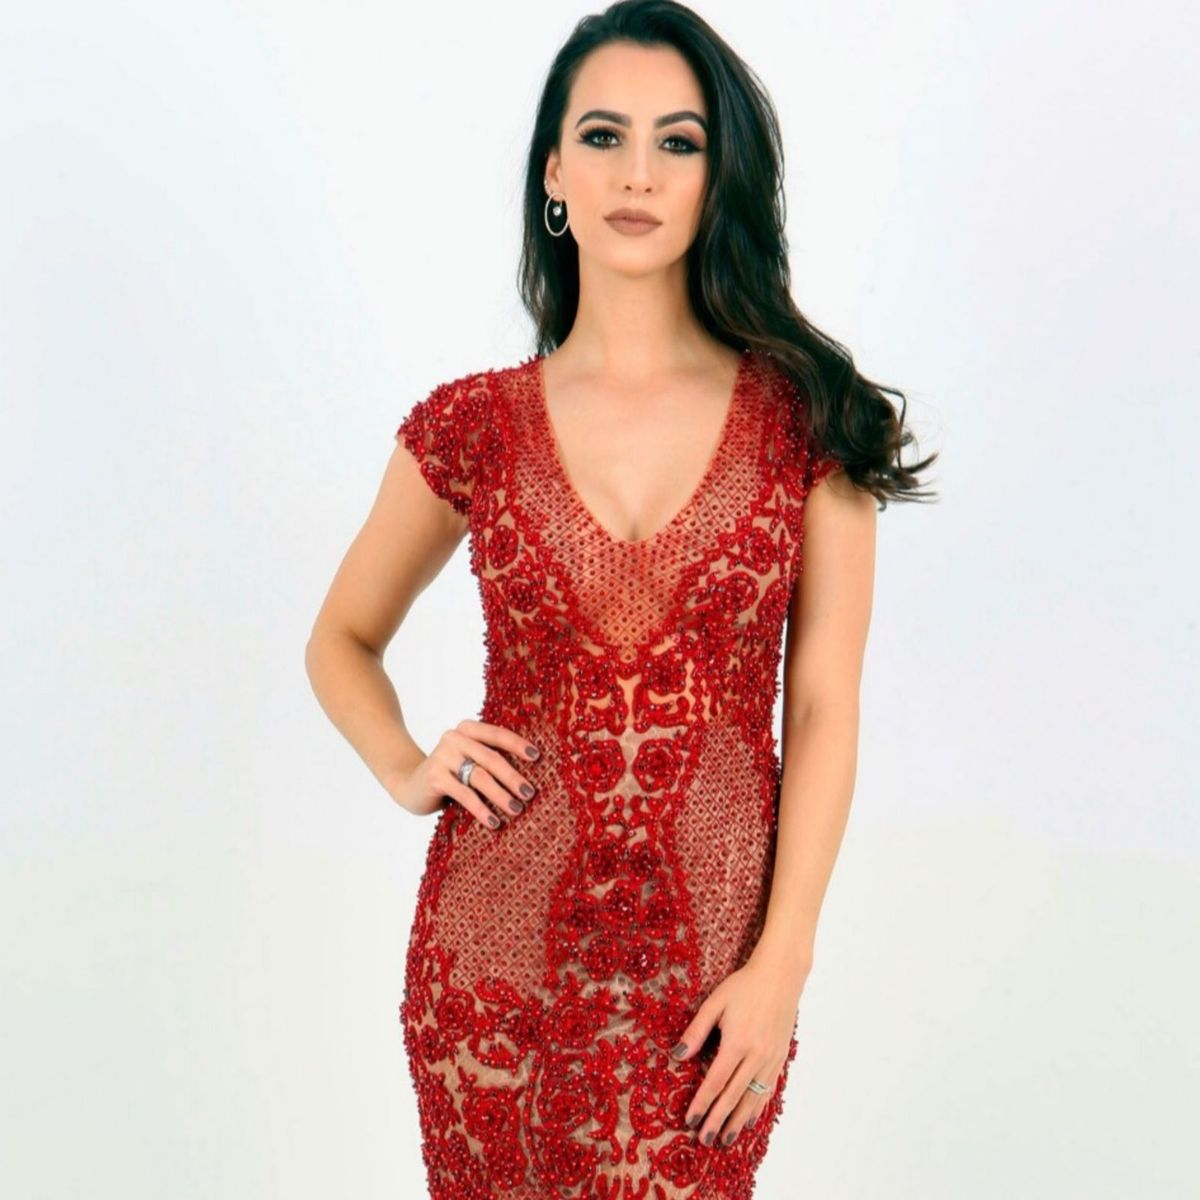 ca790535a6 Vestido Patrícia Bonaldi Patbo Pat Bo Vermelho Curto Bordado Marsala  Pedraria Renda